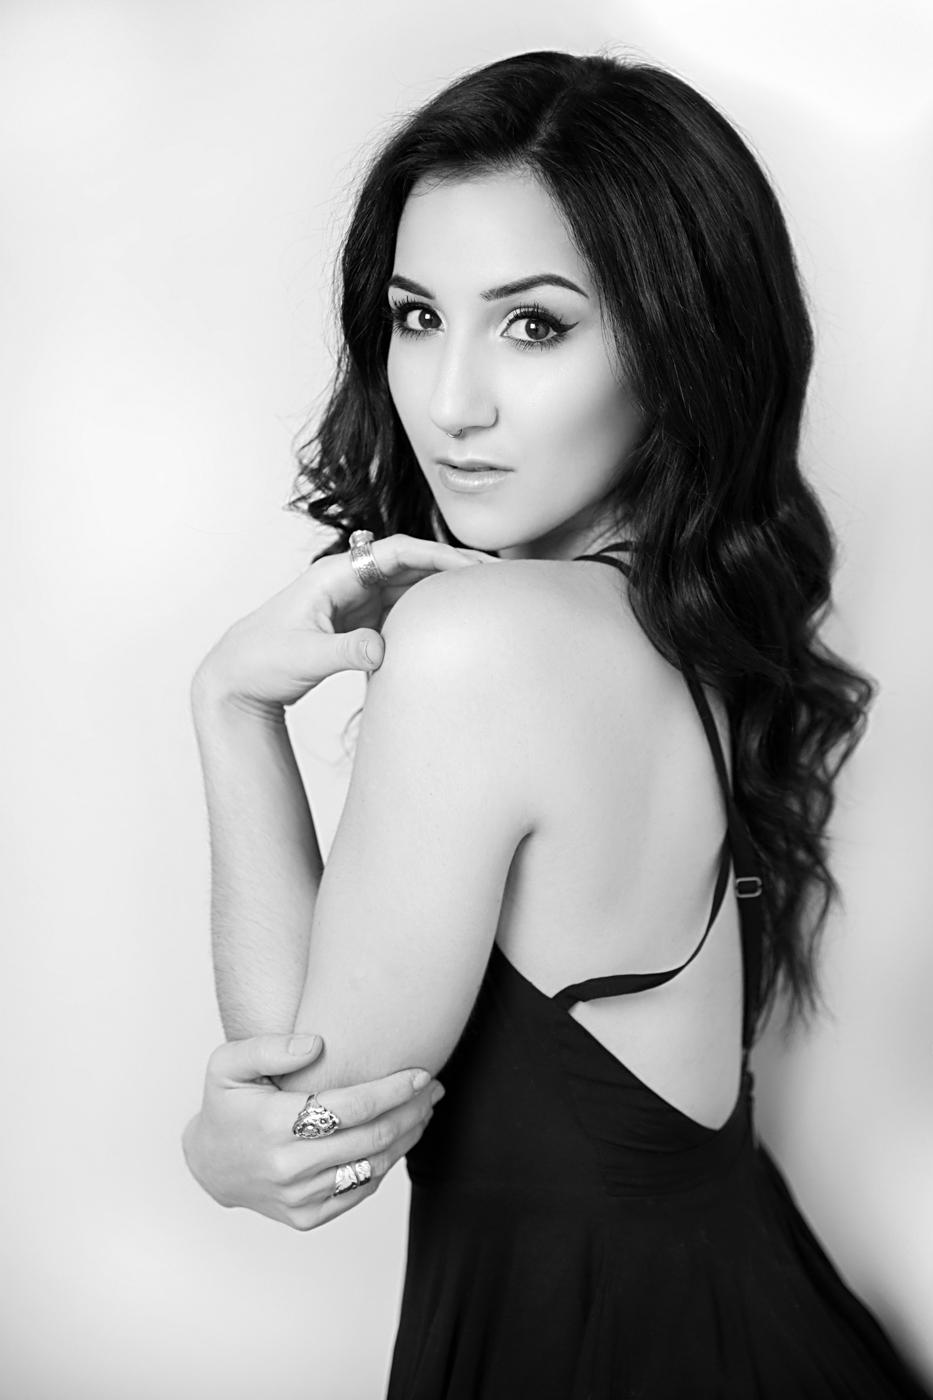 Jessica-Daniel-Engagement-Photo-Shoot-in-the-heart-of-Washington-DC-Ksenia-Pro-Photography-20